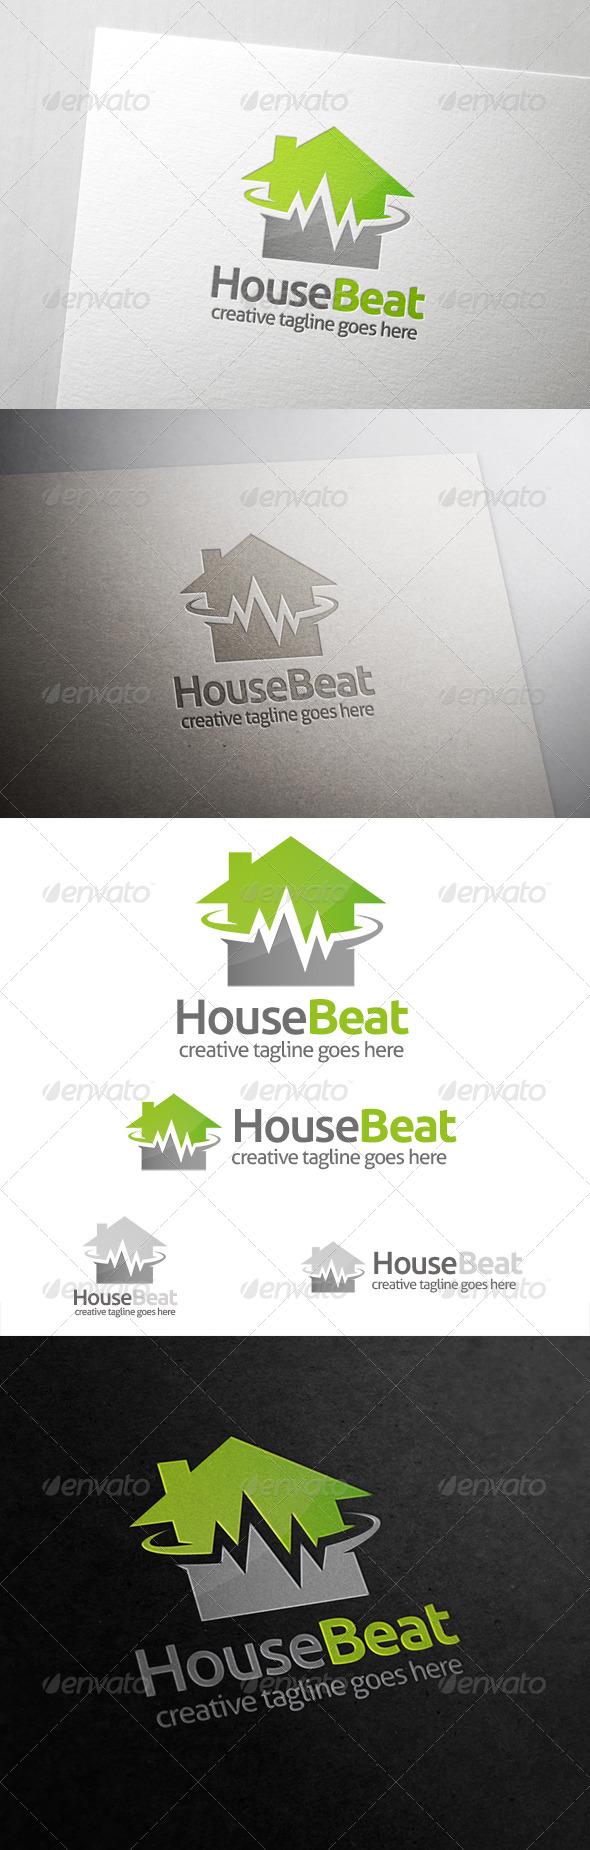 GraphicRiver House Beat Logo 6823571